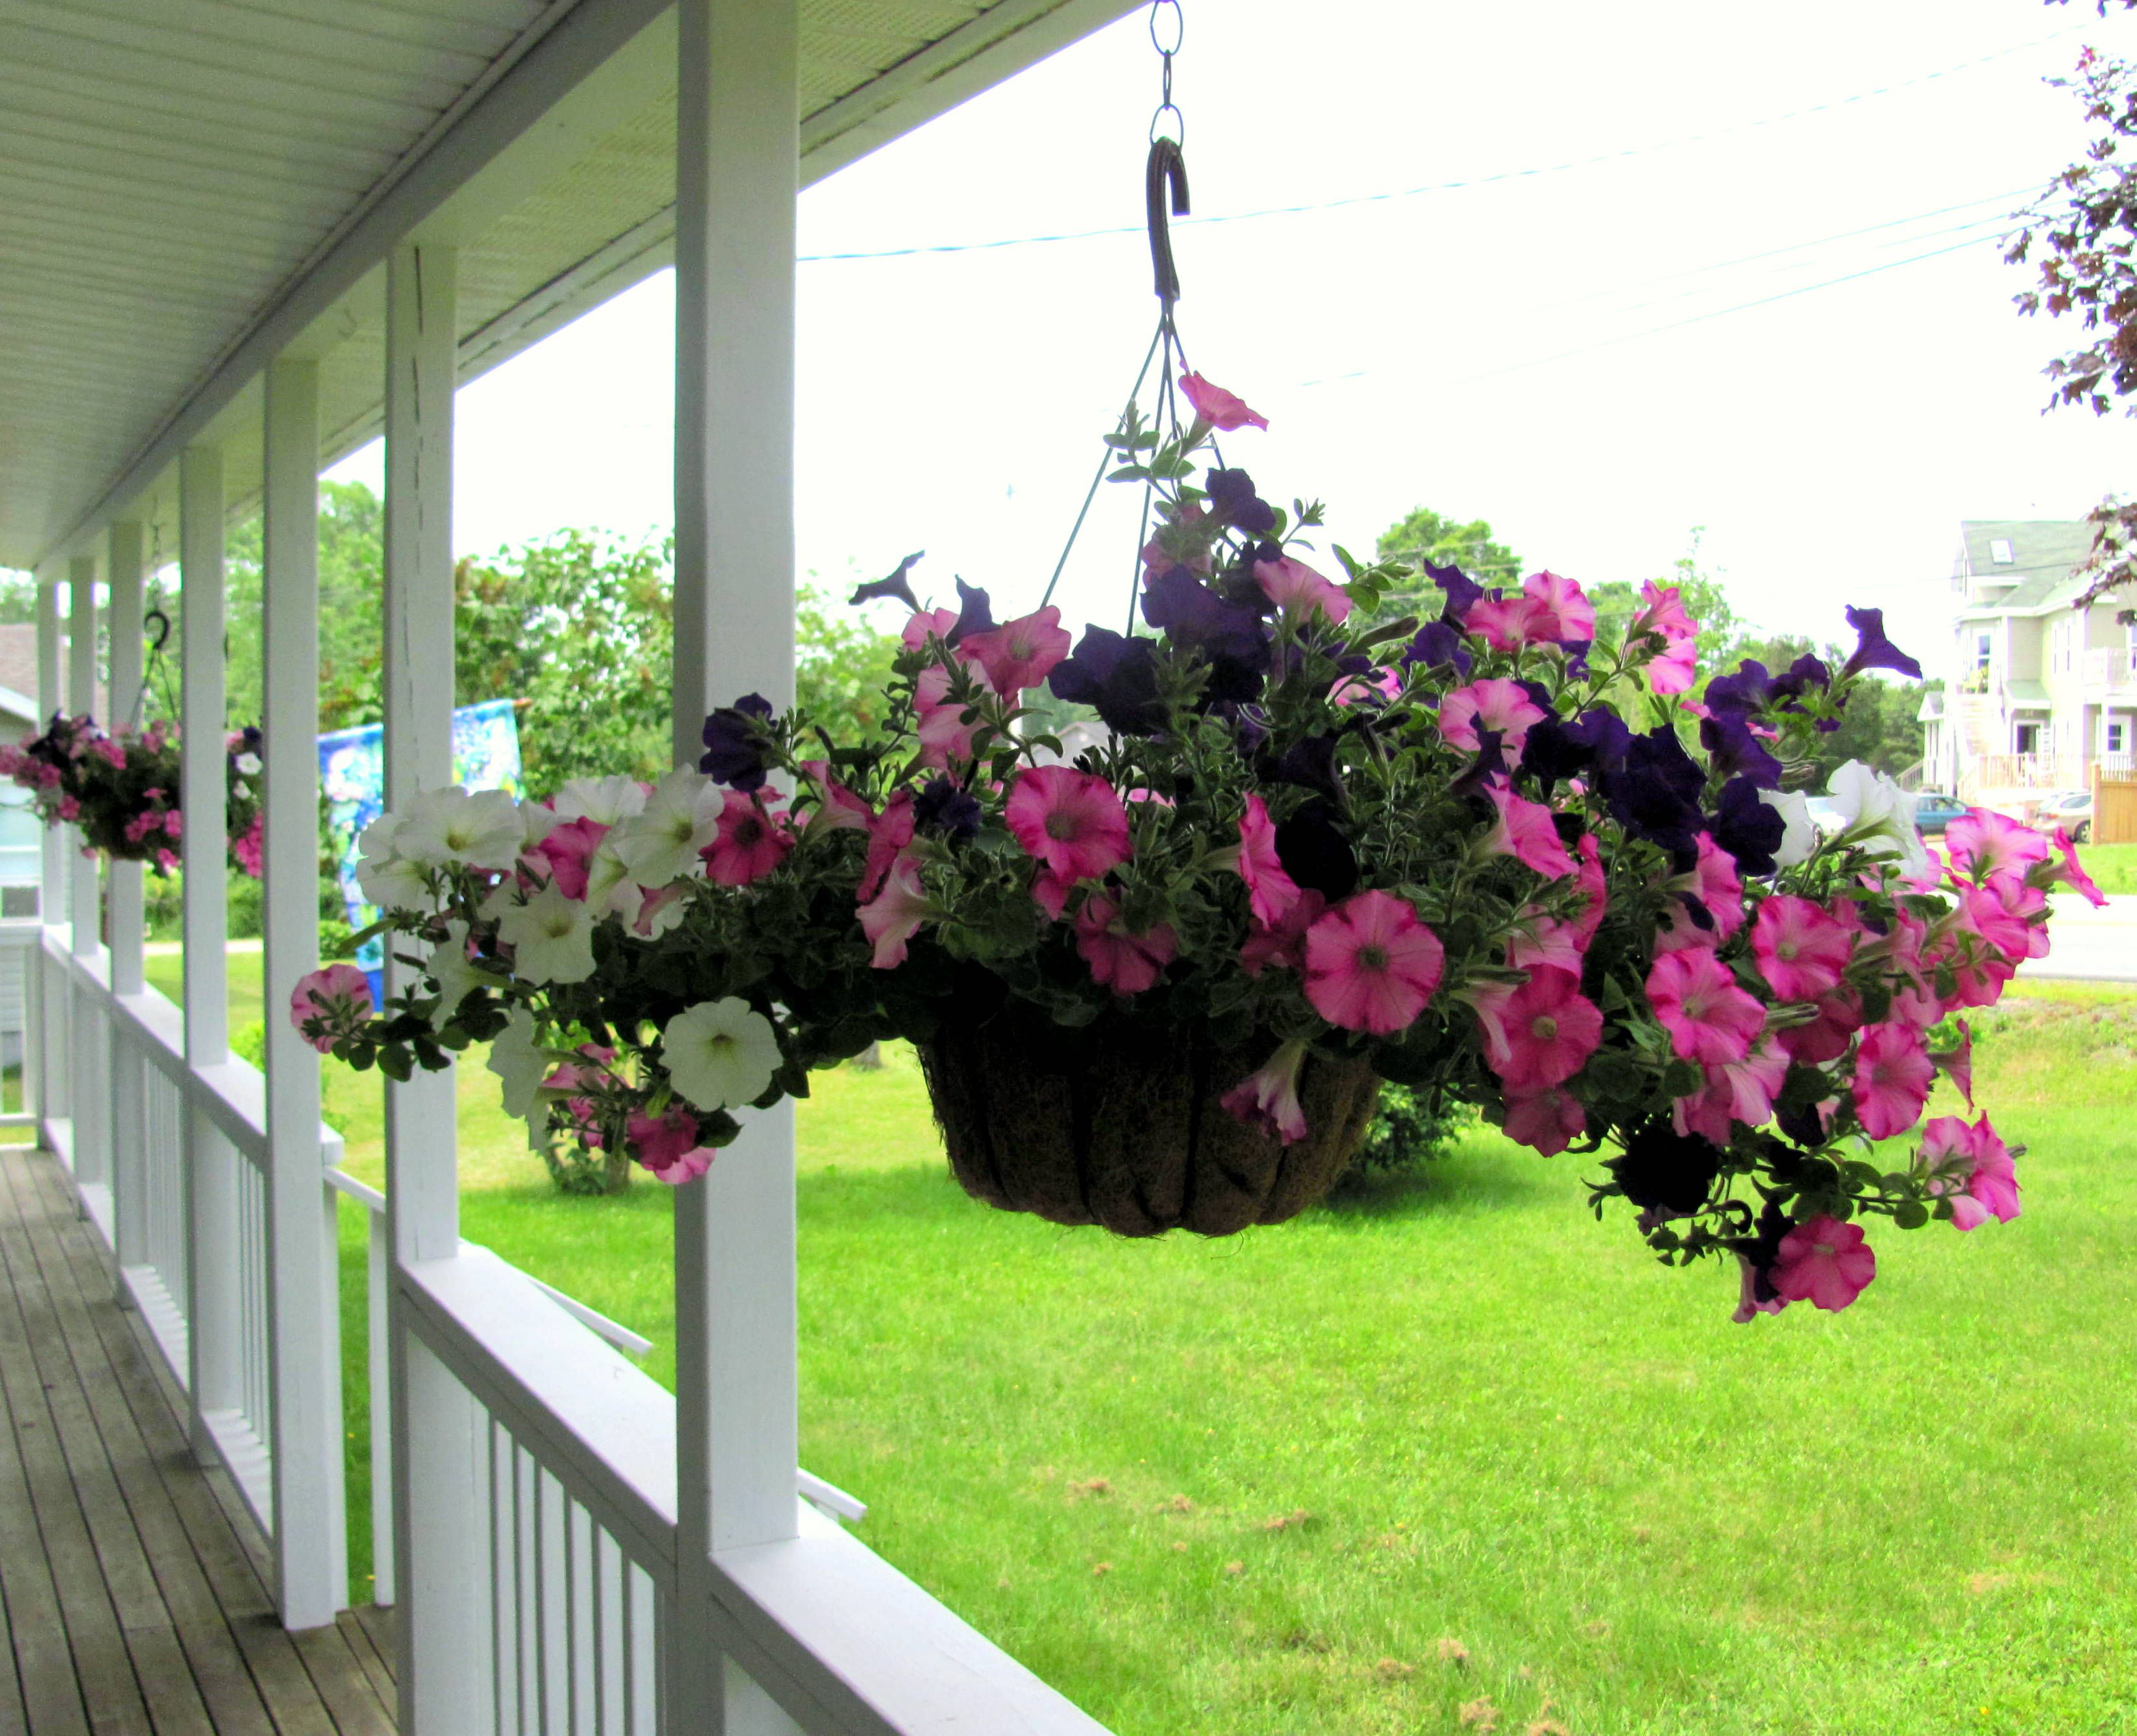 Wave Petunia Hanging Basket With Images Petunia Hanging